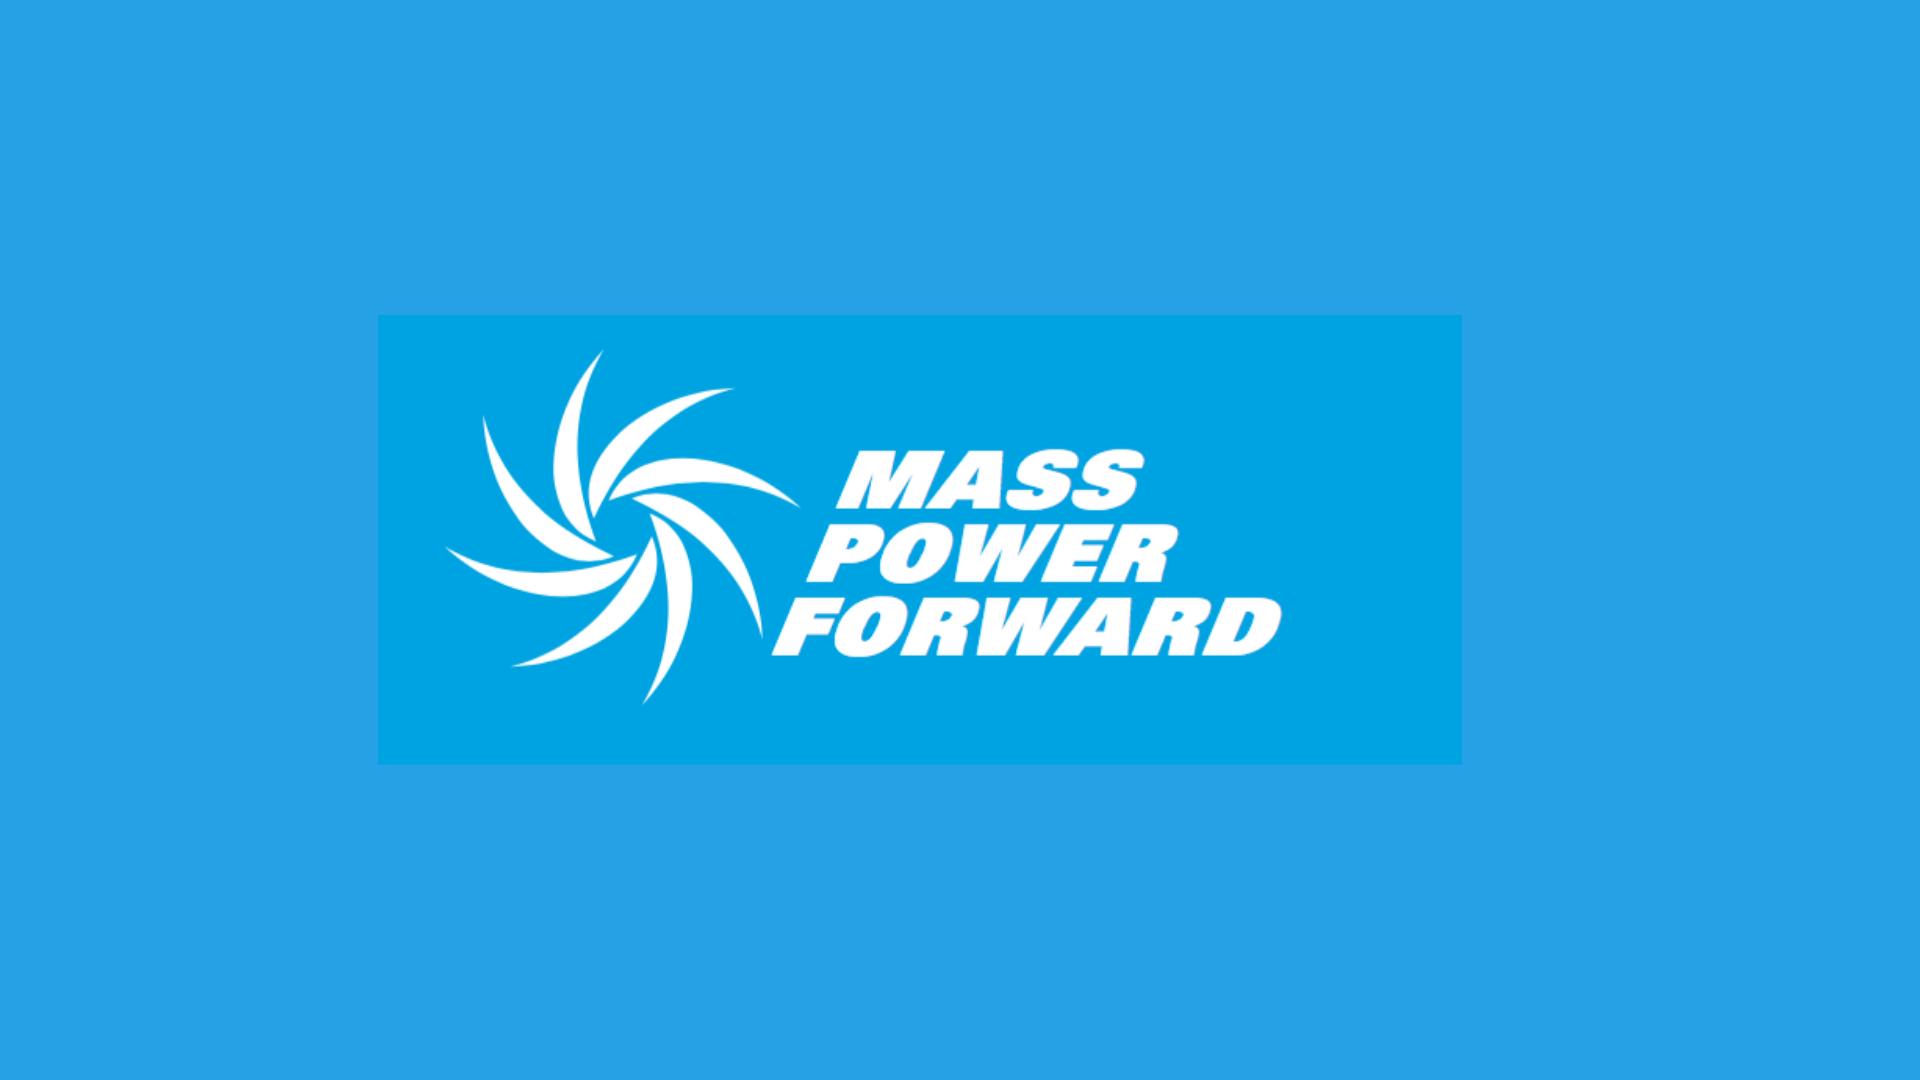 Mass Power Forward image